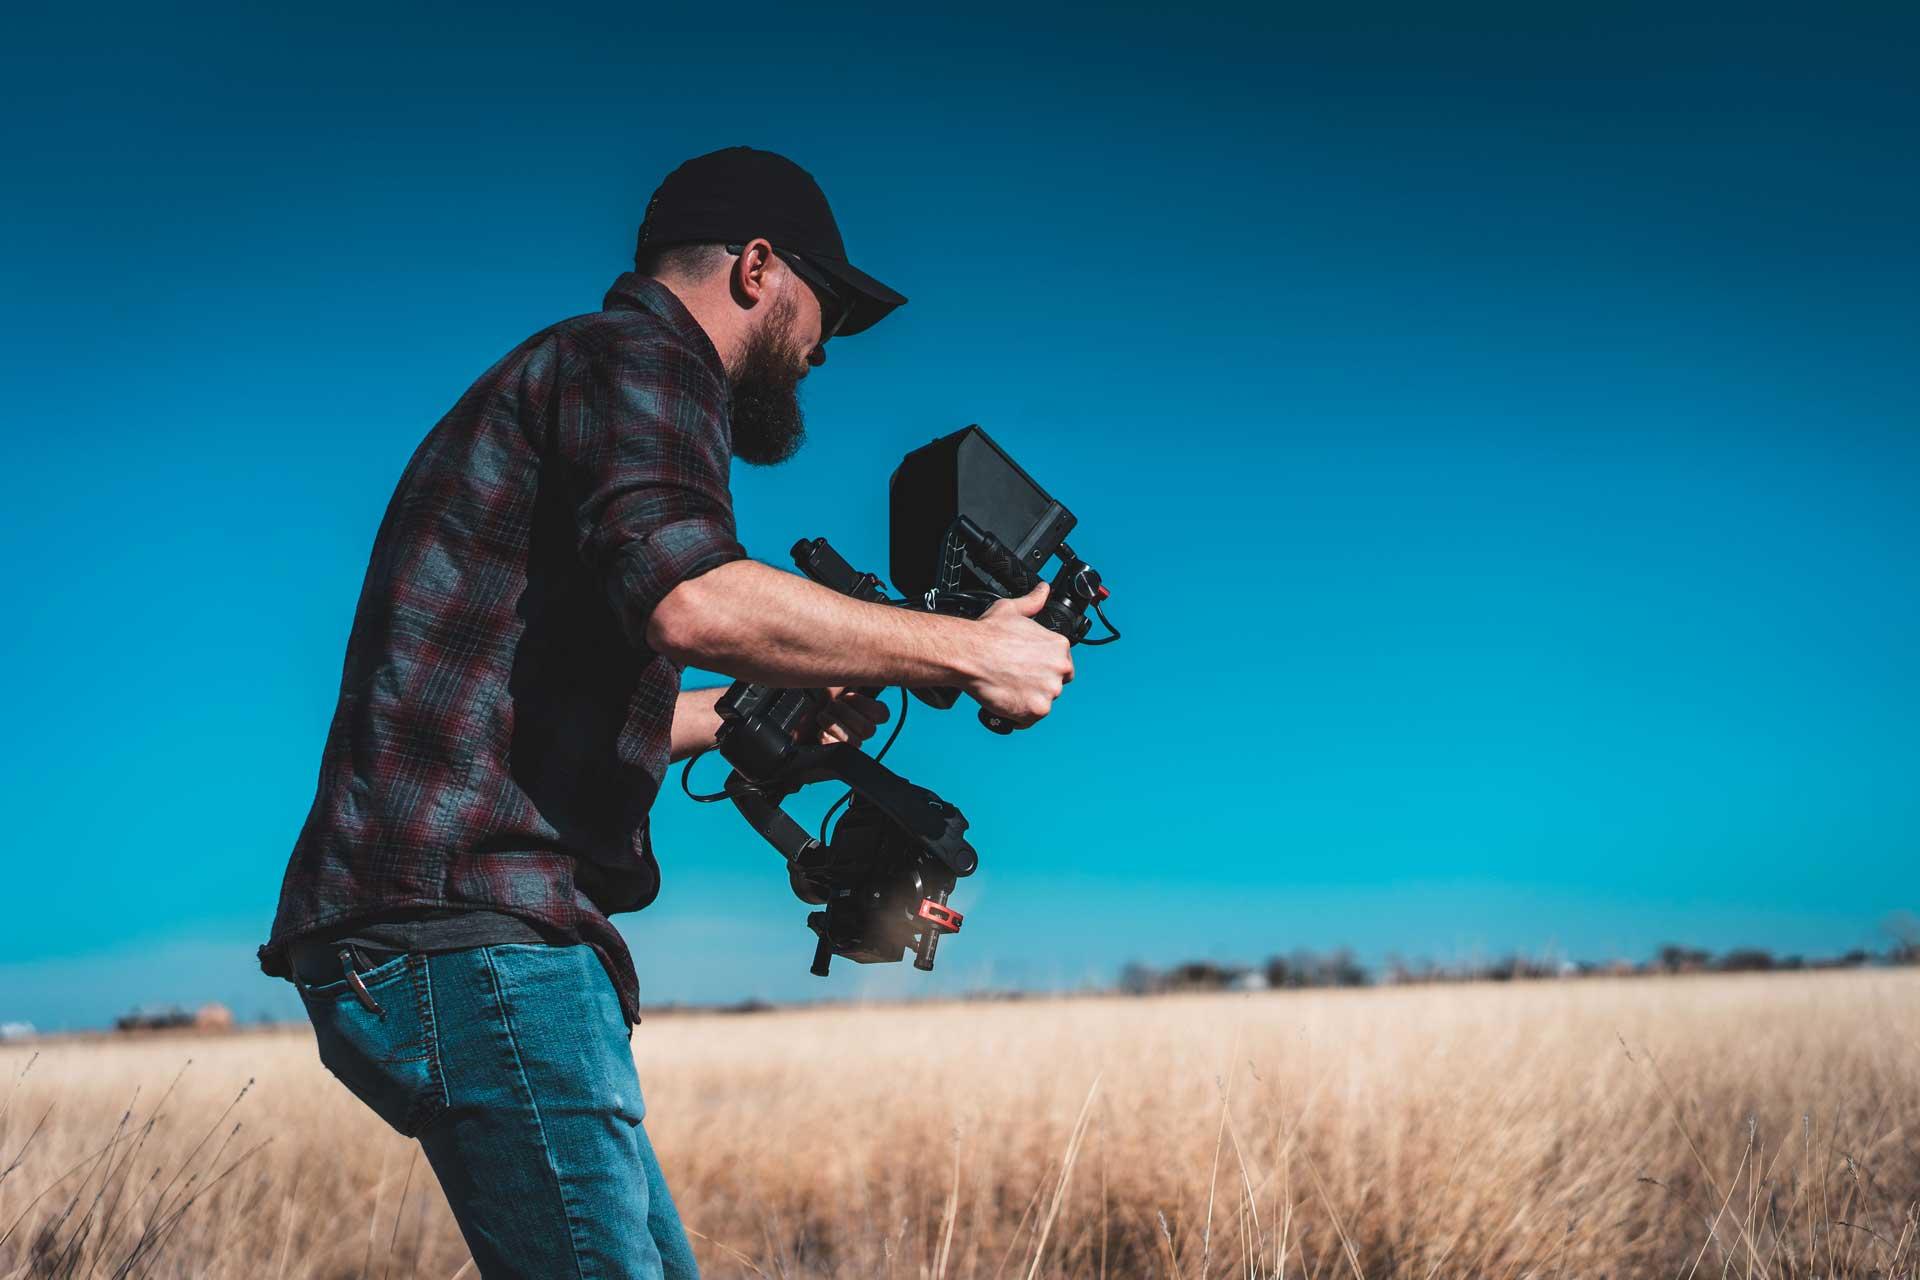 creative_cannon_video_shoot-3